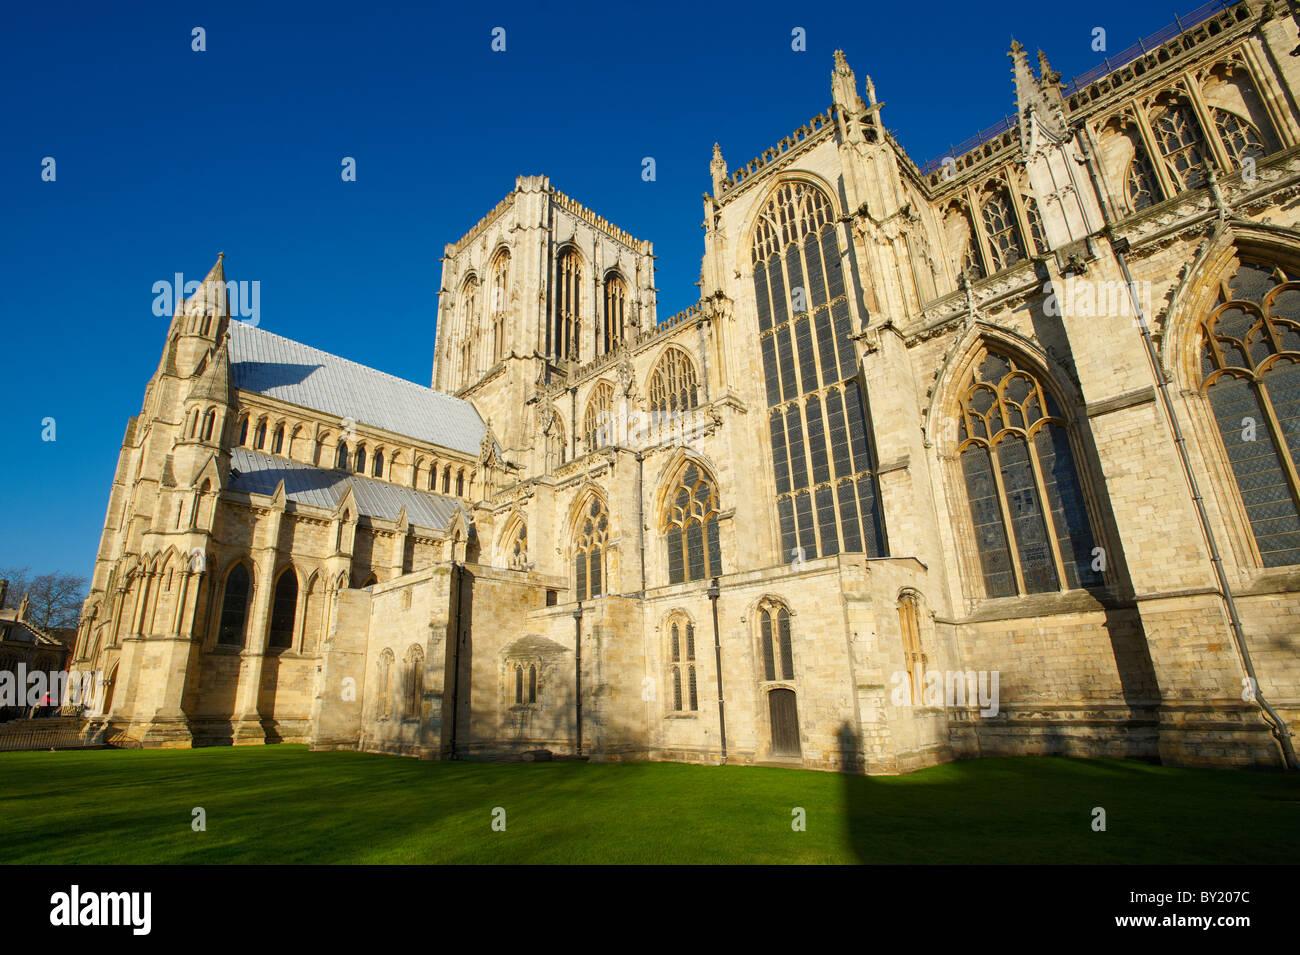 York Minster exterior, England - Stock Image